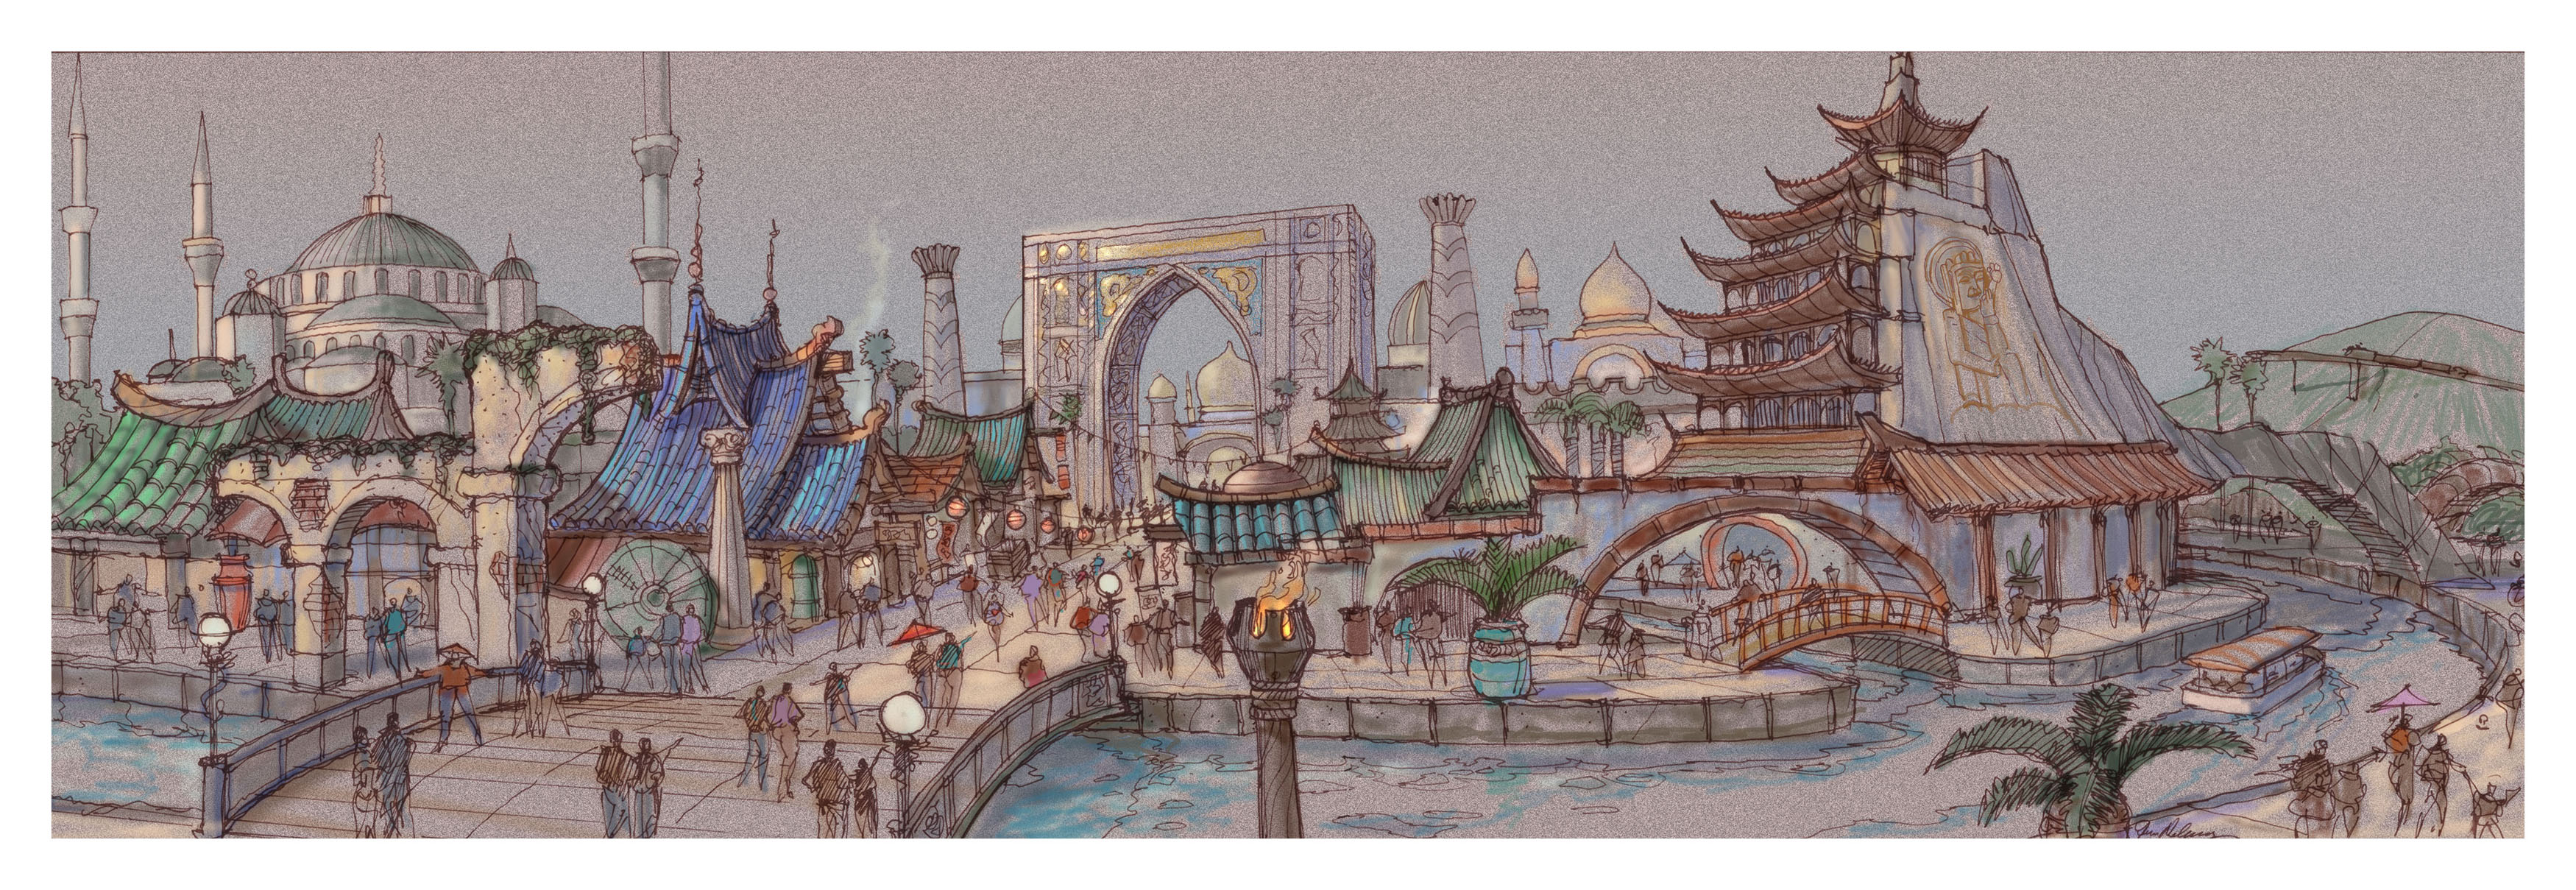 Silk Road Land, Adventure Kingdom